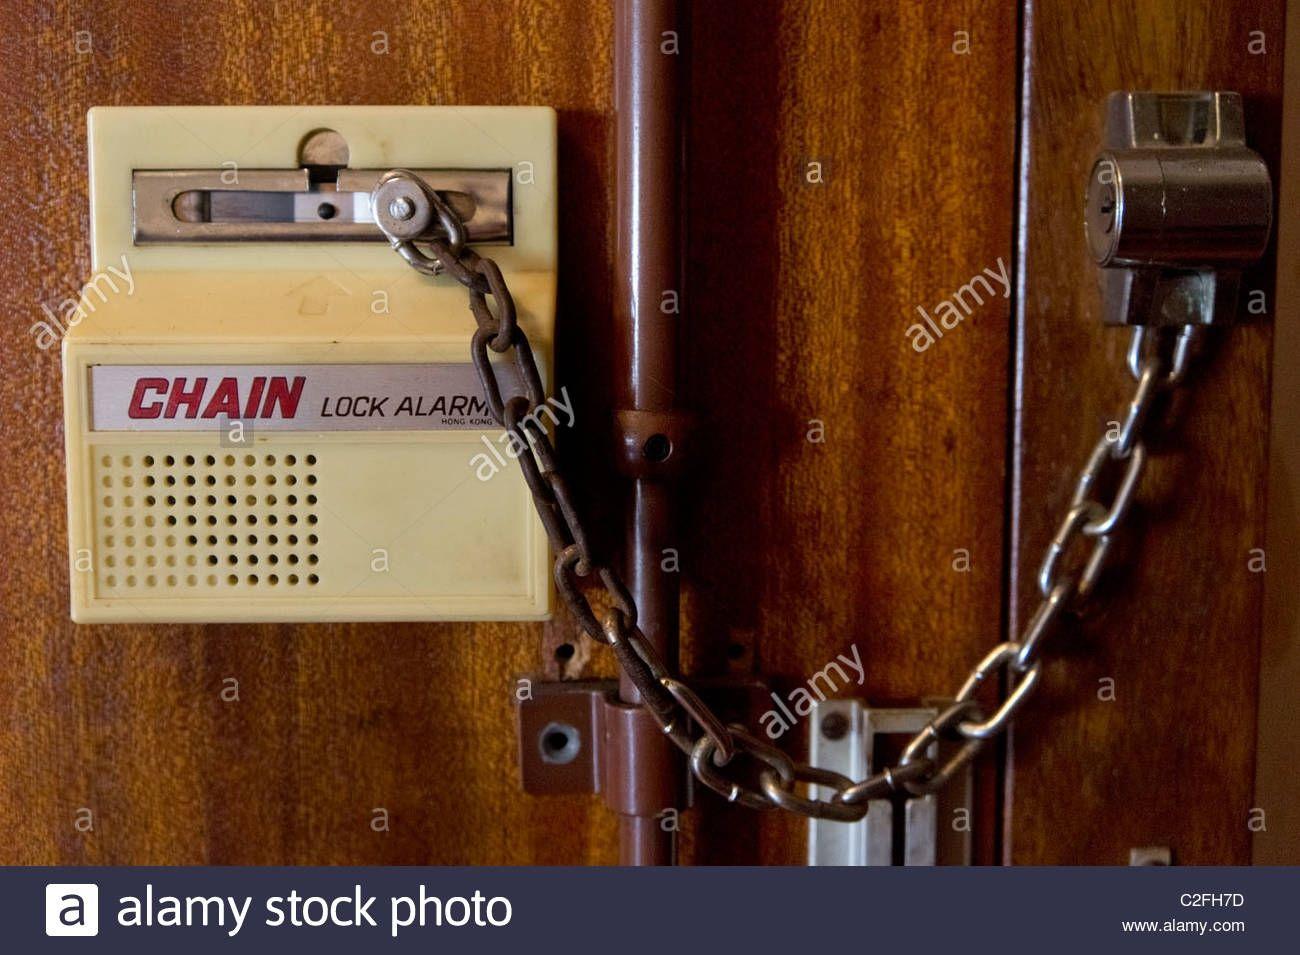 Security Door Chain With Alarm | http://franzdondi.com | Pinterest ...